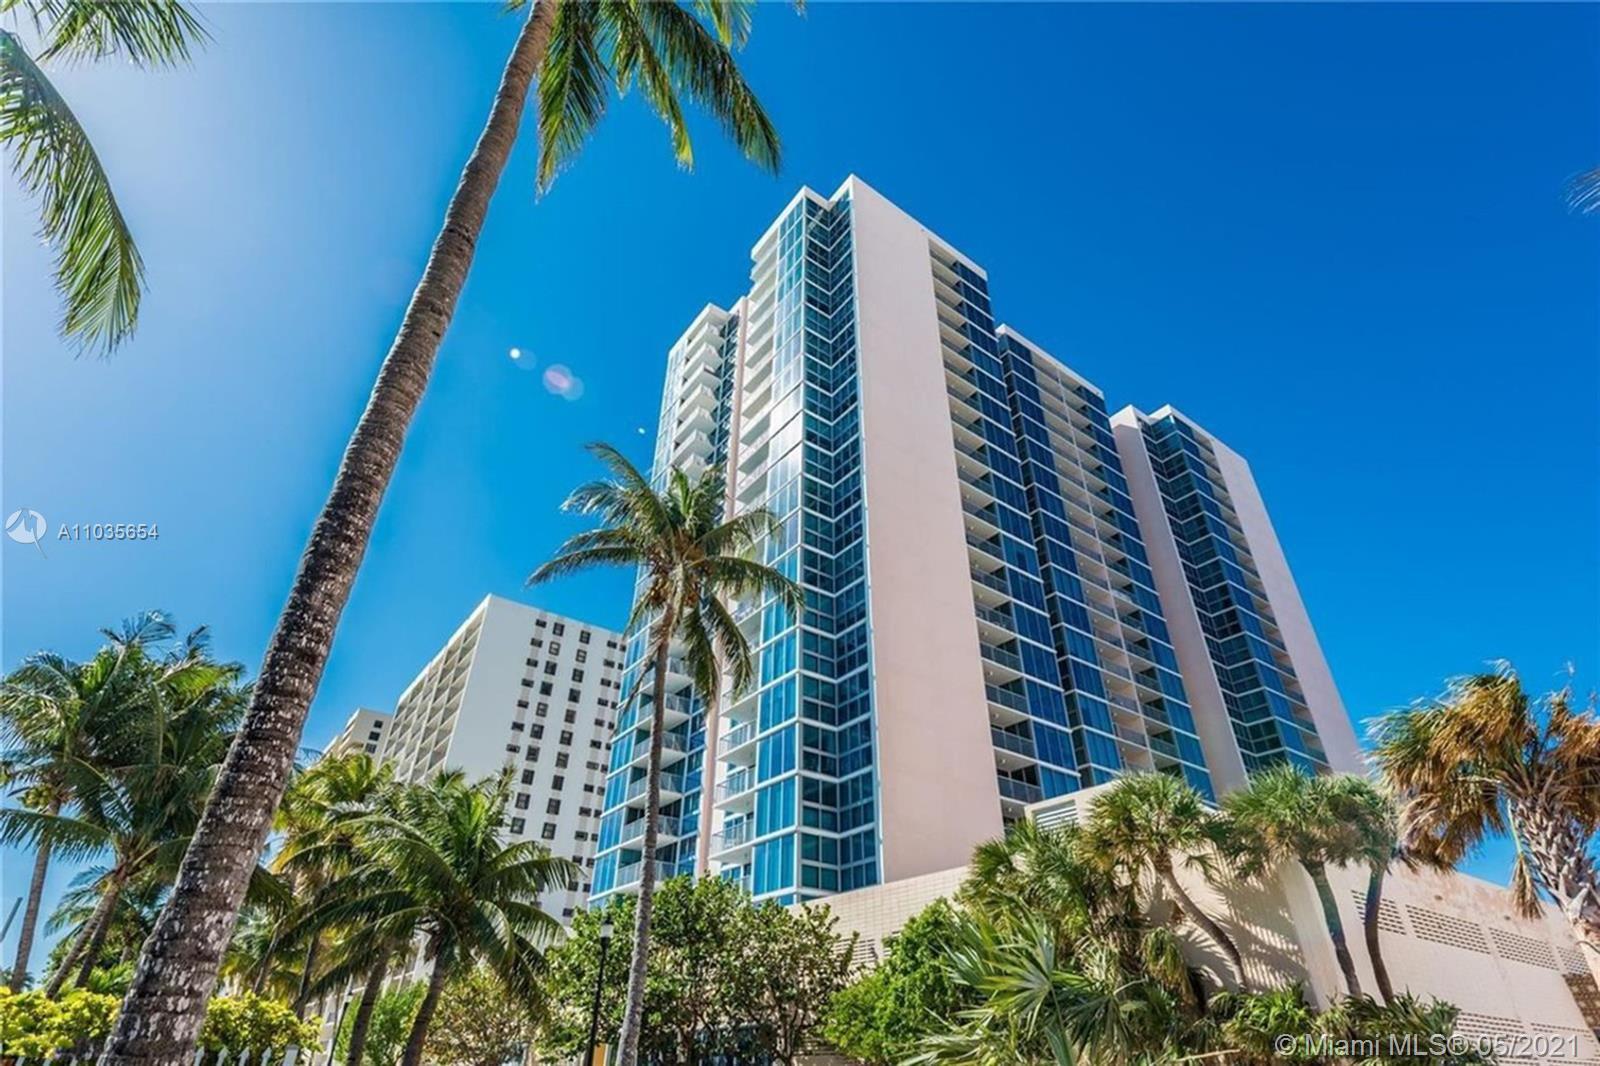 Mirasol Ocean Towers #606 - 2655 Collins Ave #606, Miami Beach, FL 33140